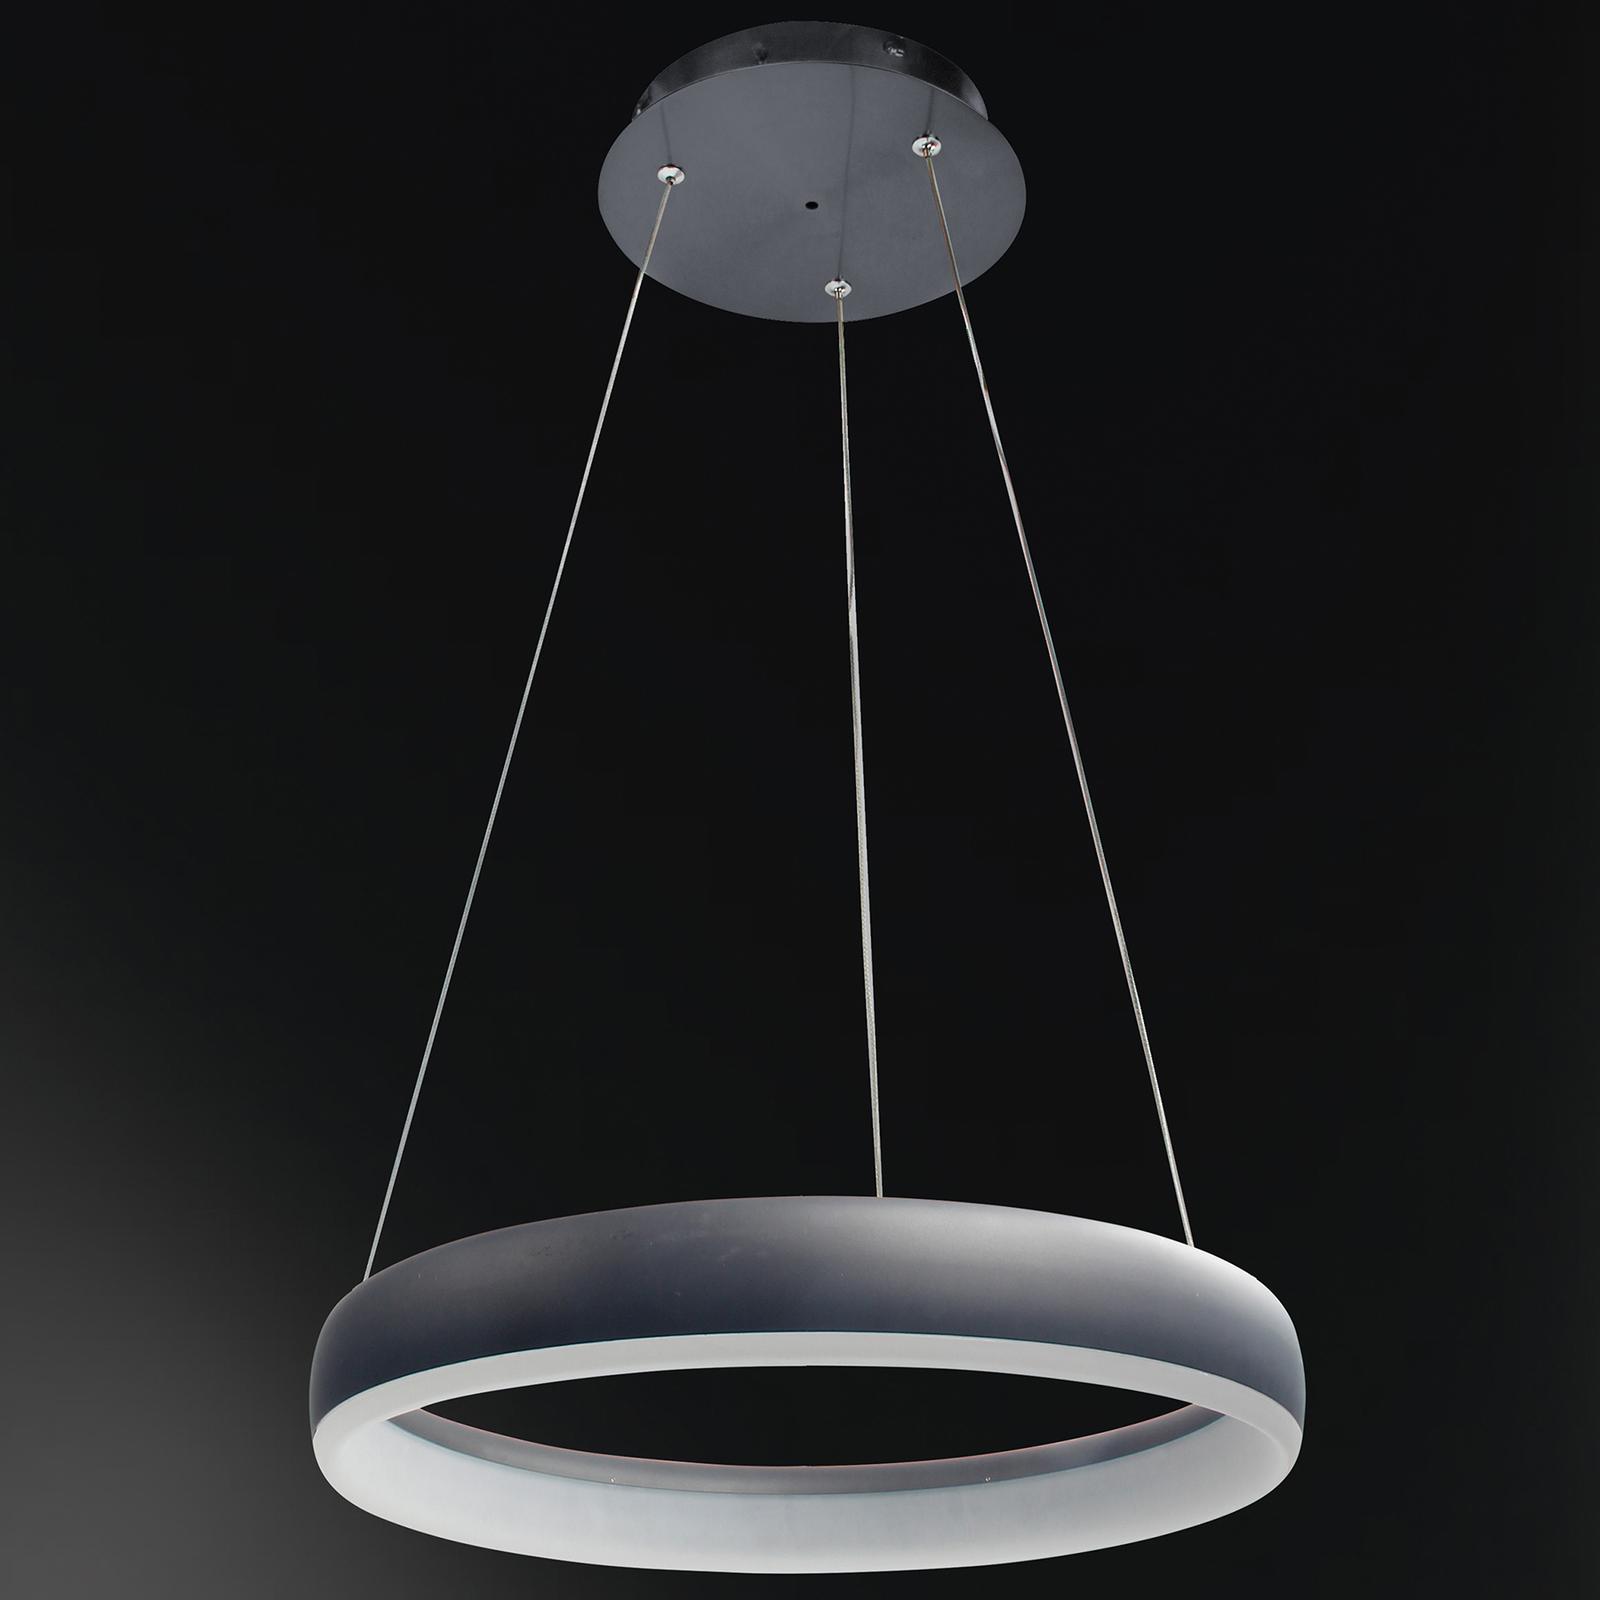 WiZ Clint LED-riippuvalaisin musta, Ø 40 cm